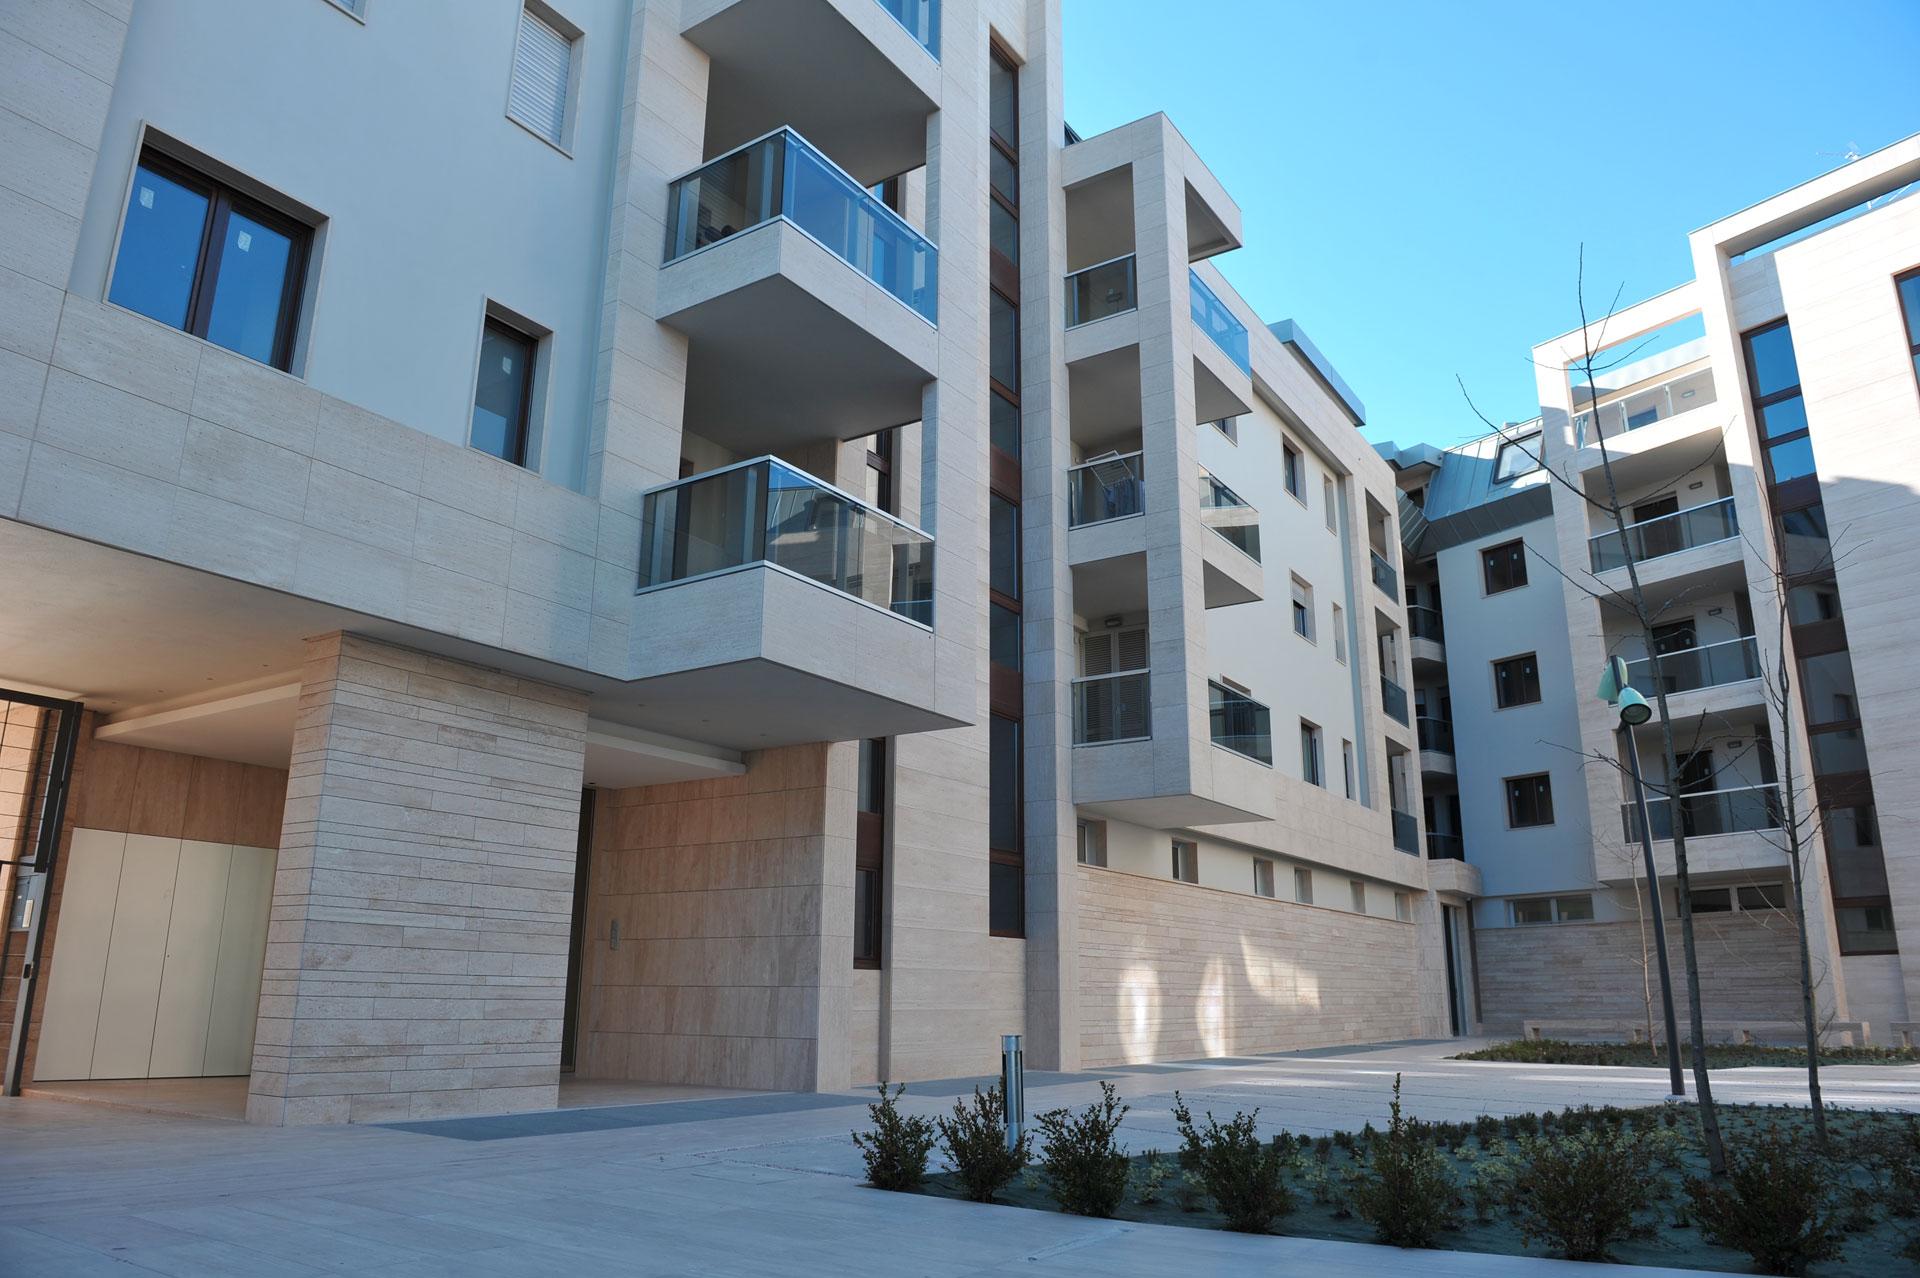 Appartamenti viale regina margherita altamura for Piani di appartamenti stretti